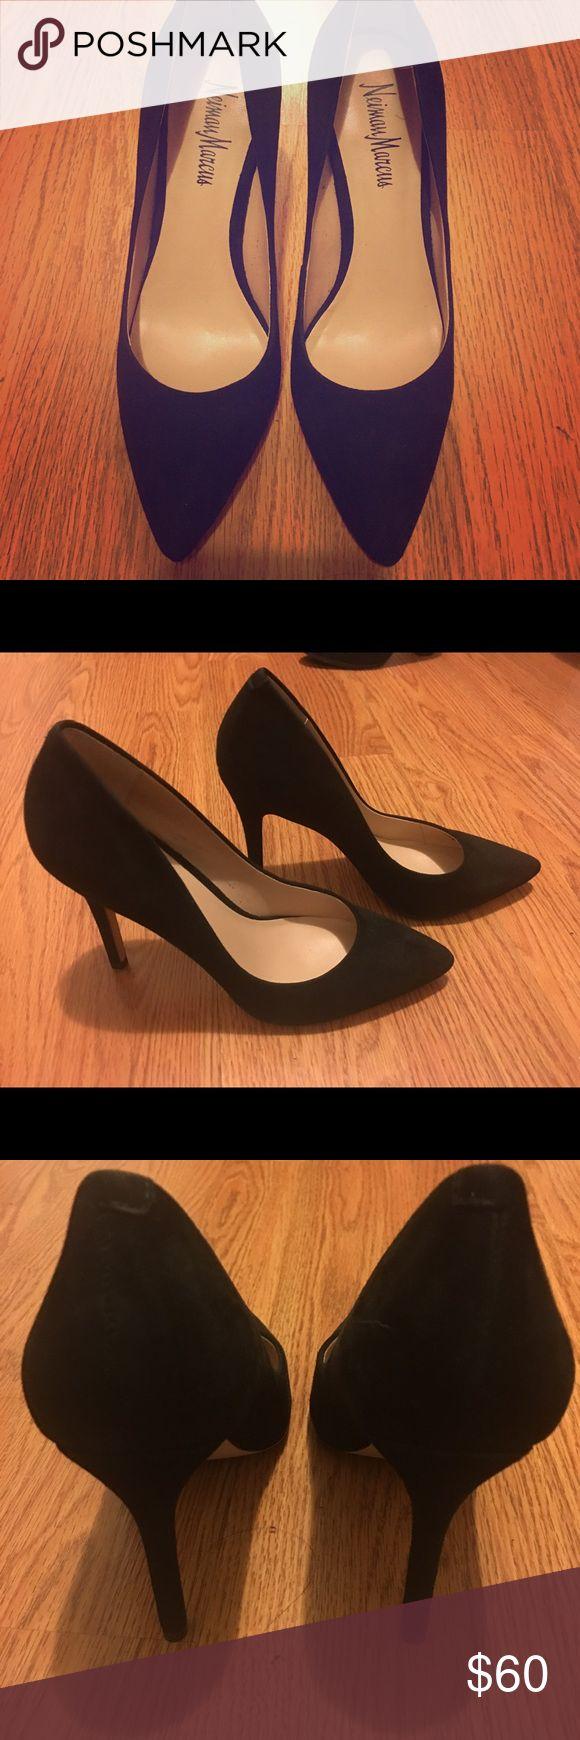 Neiman Marcus Stiletto Heels Neiman Marcus Stiletto Heels size 6M worn once Neiman Marcus Shoes Heels